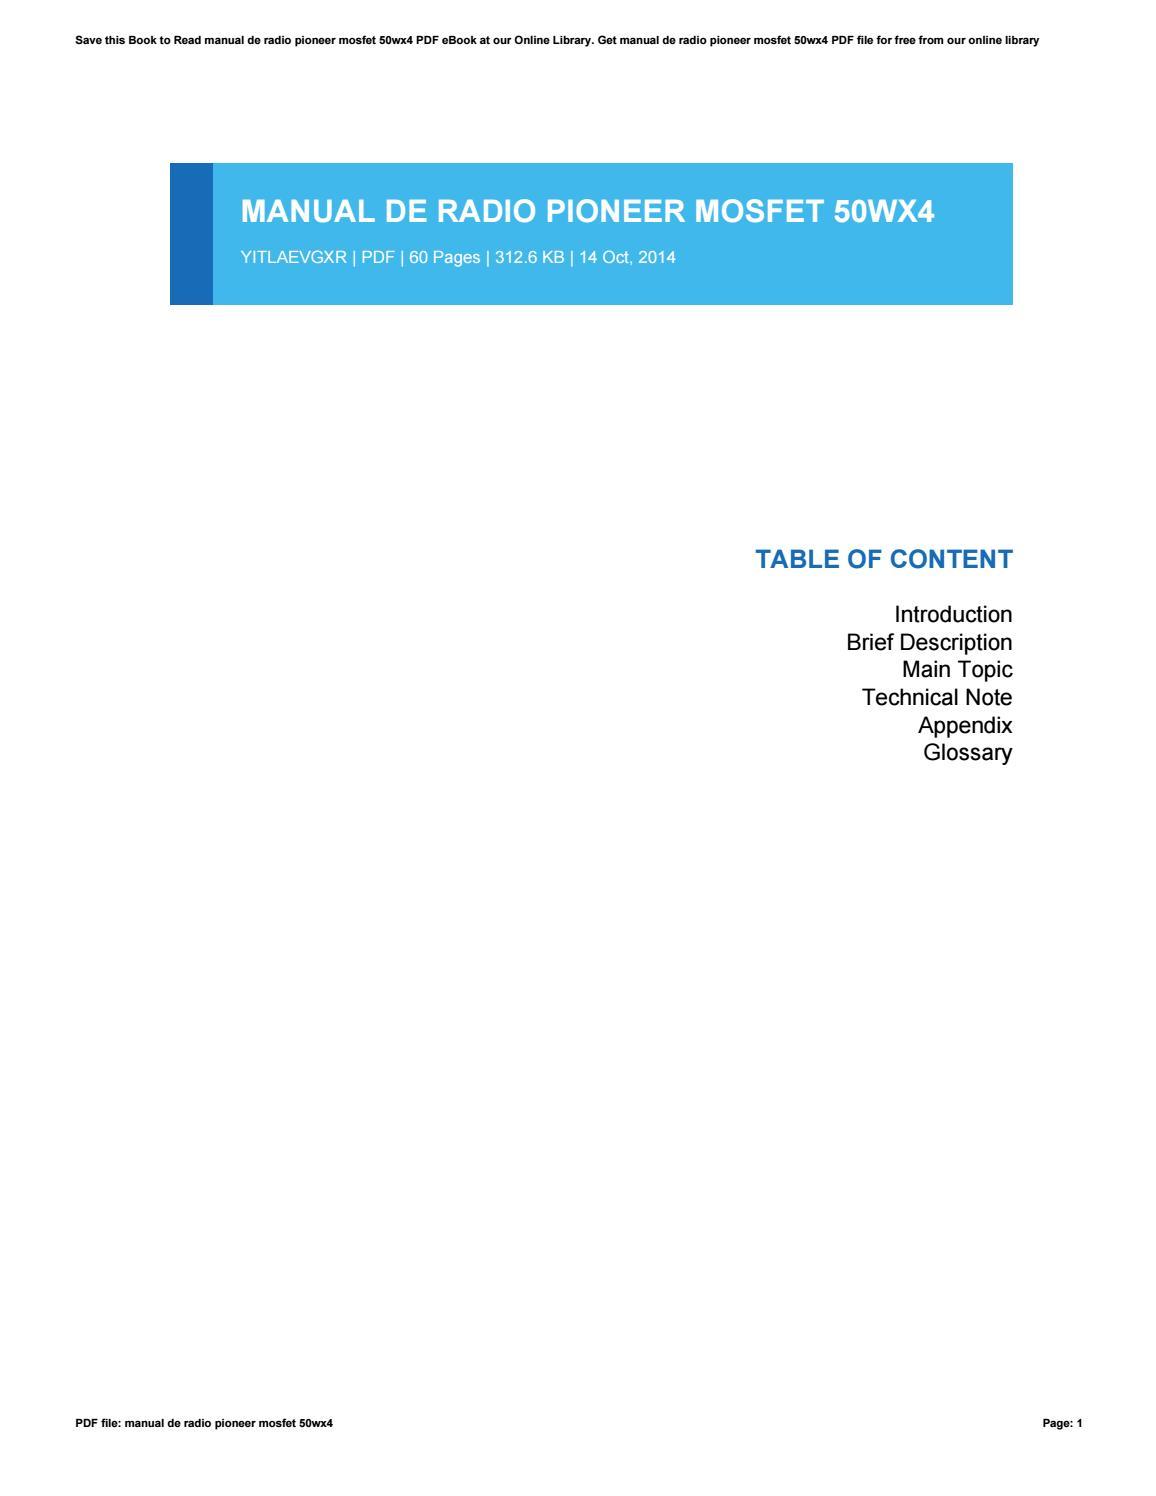 Manual de instrucciones pioneer mosfet 50wx4 fixya.